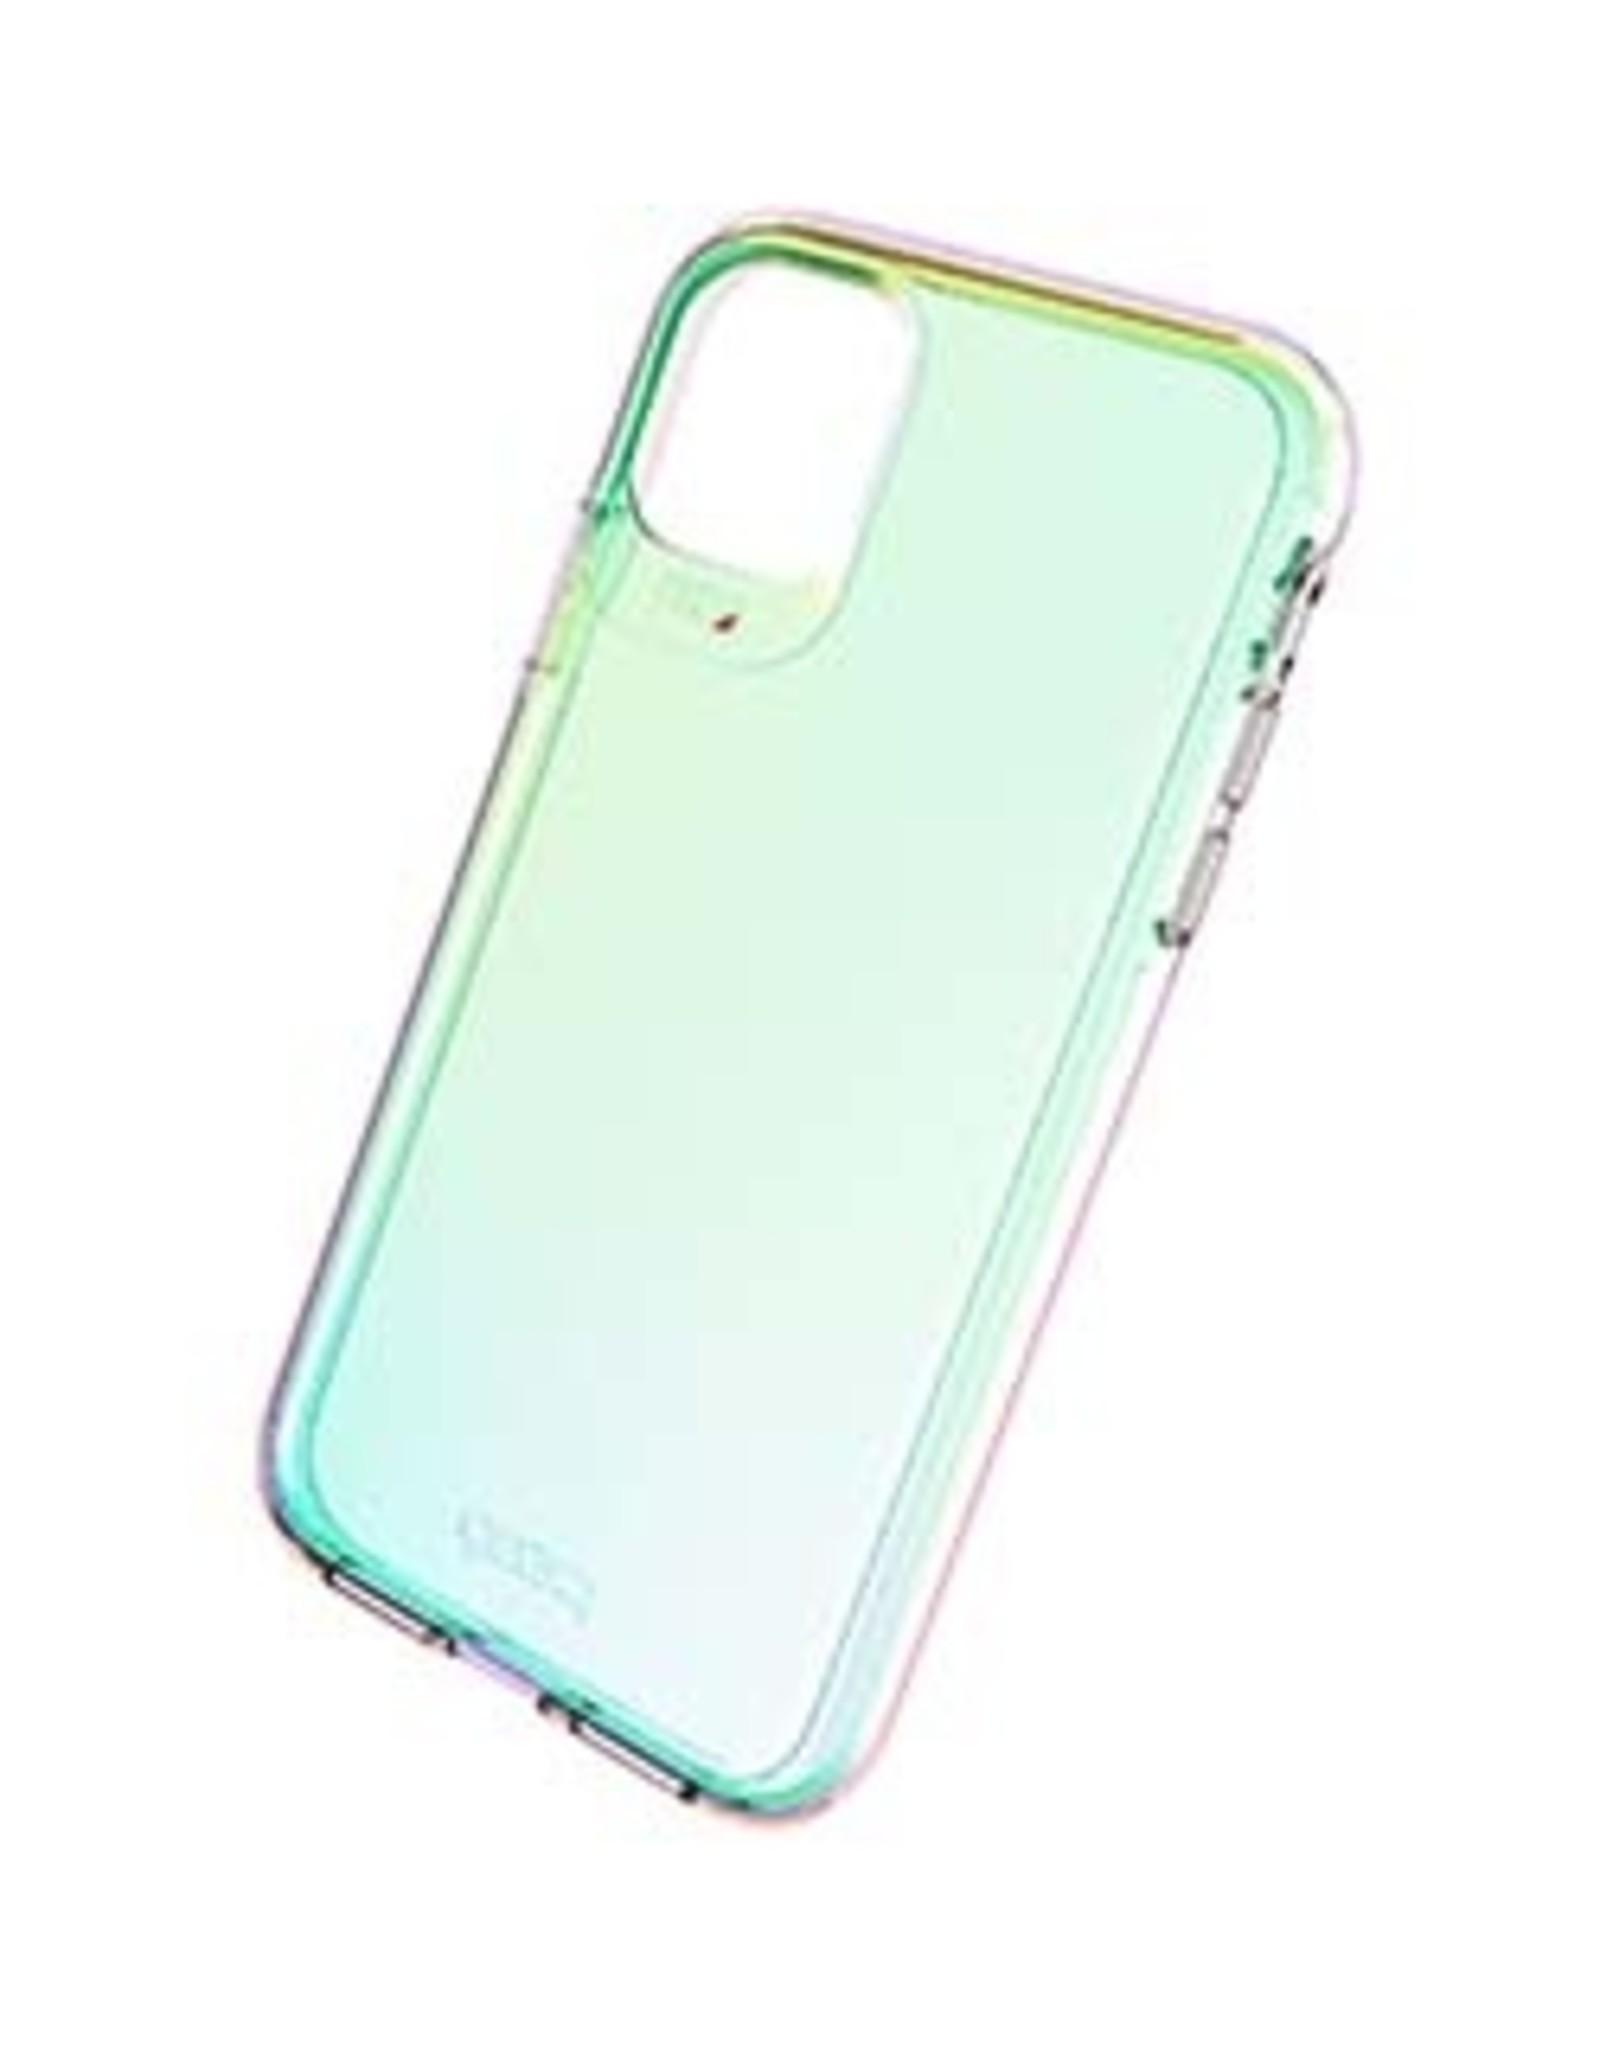 GEAR4 GEAR4 | iPhone 11 D3O Crystal Palace Iridescent Case 15-04778